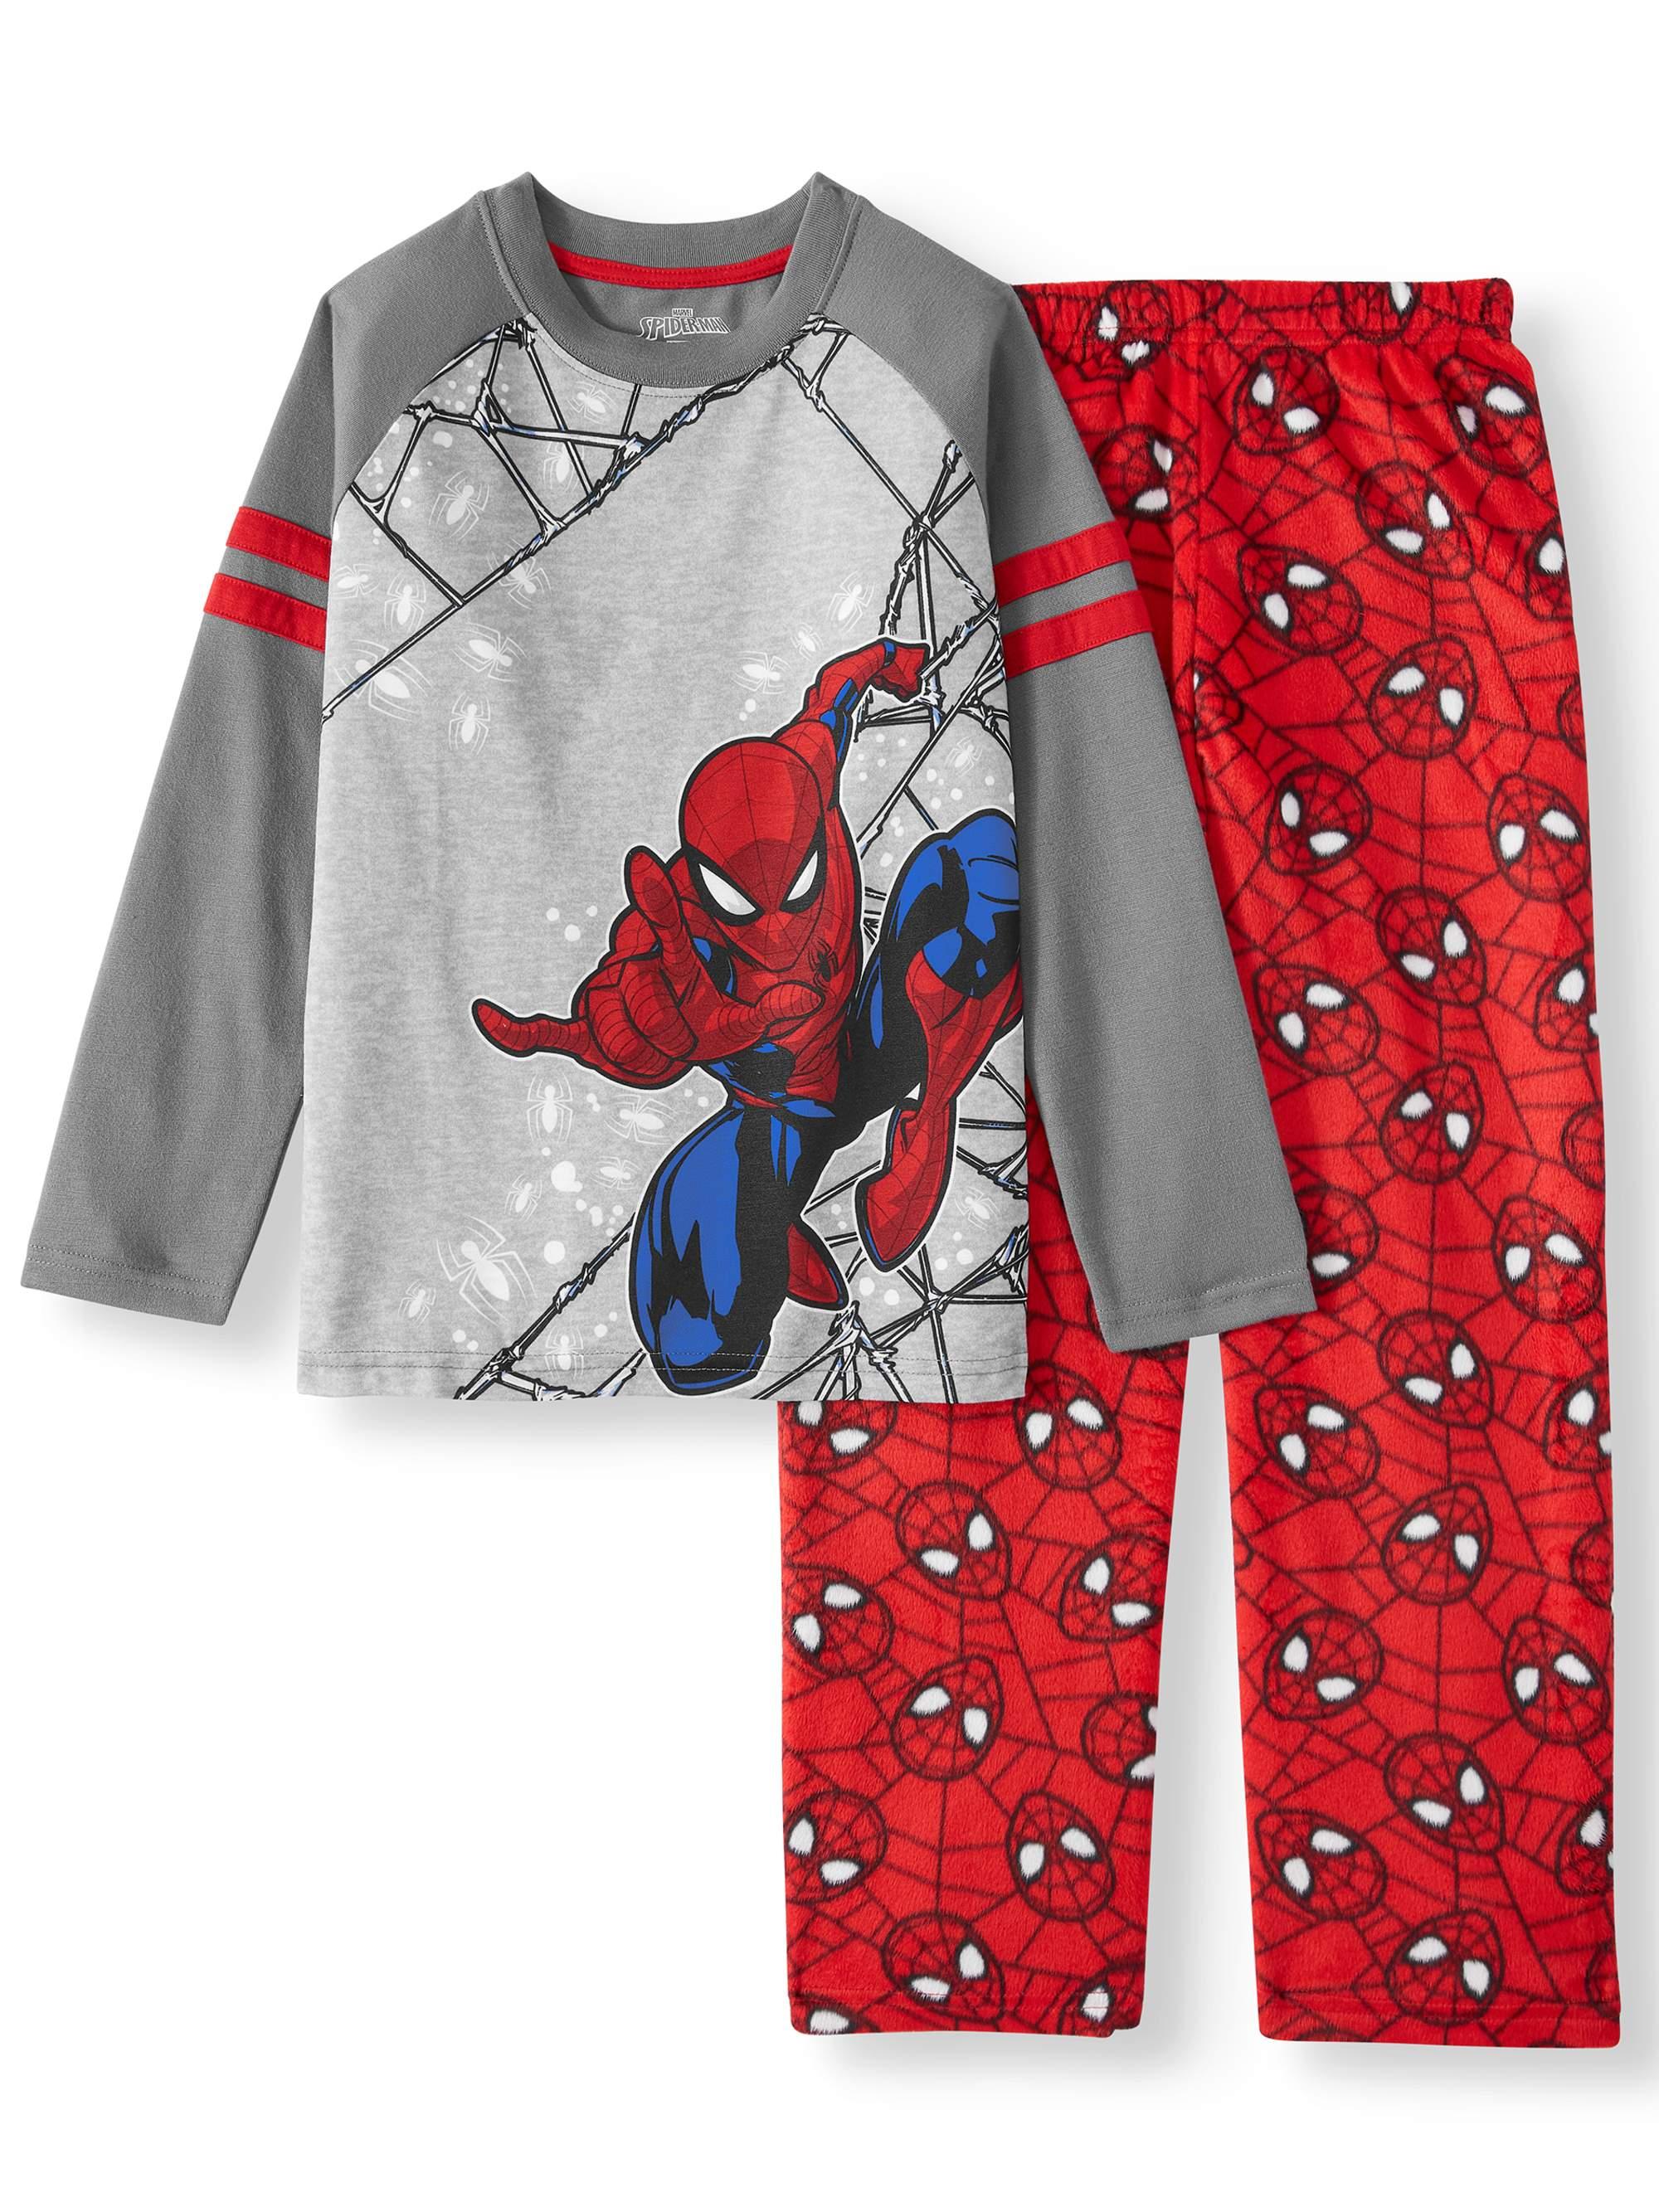 Spiderman Dress LONG SLEEVE